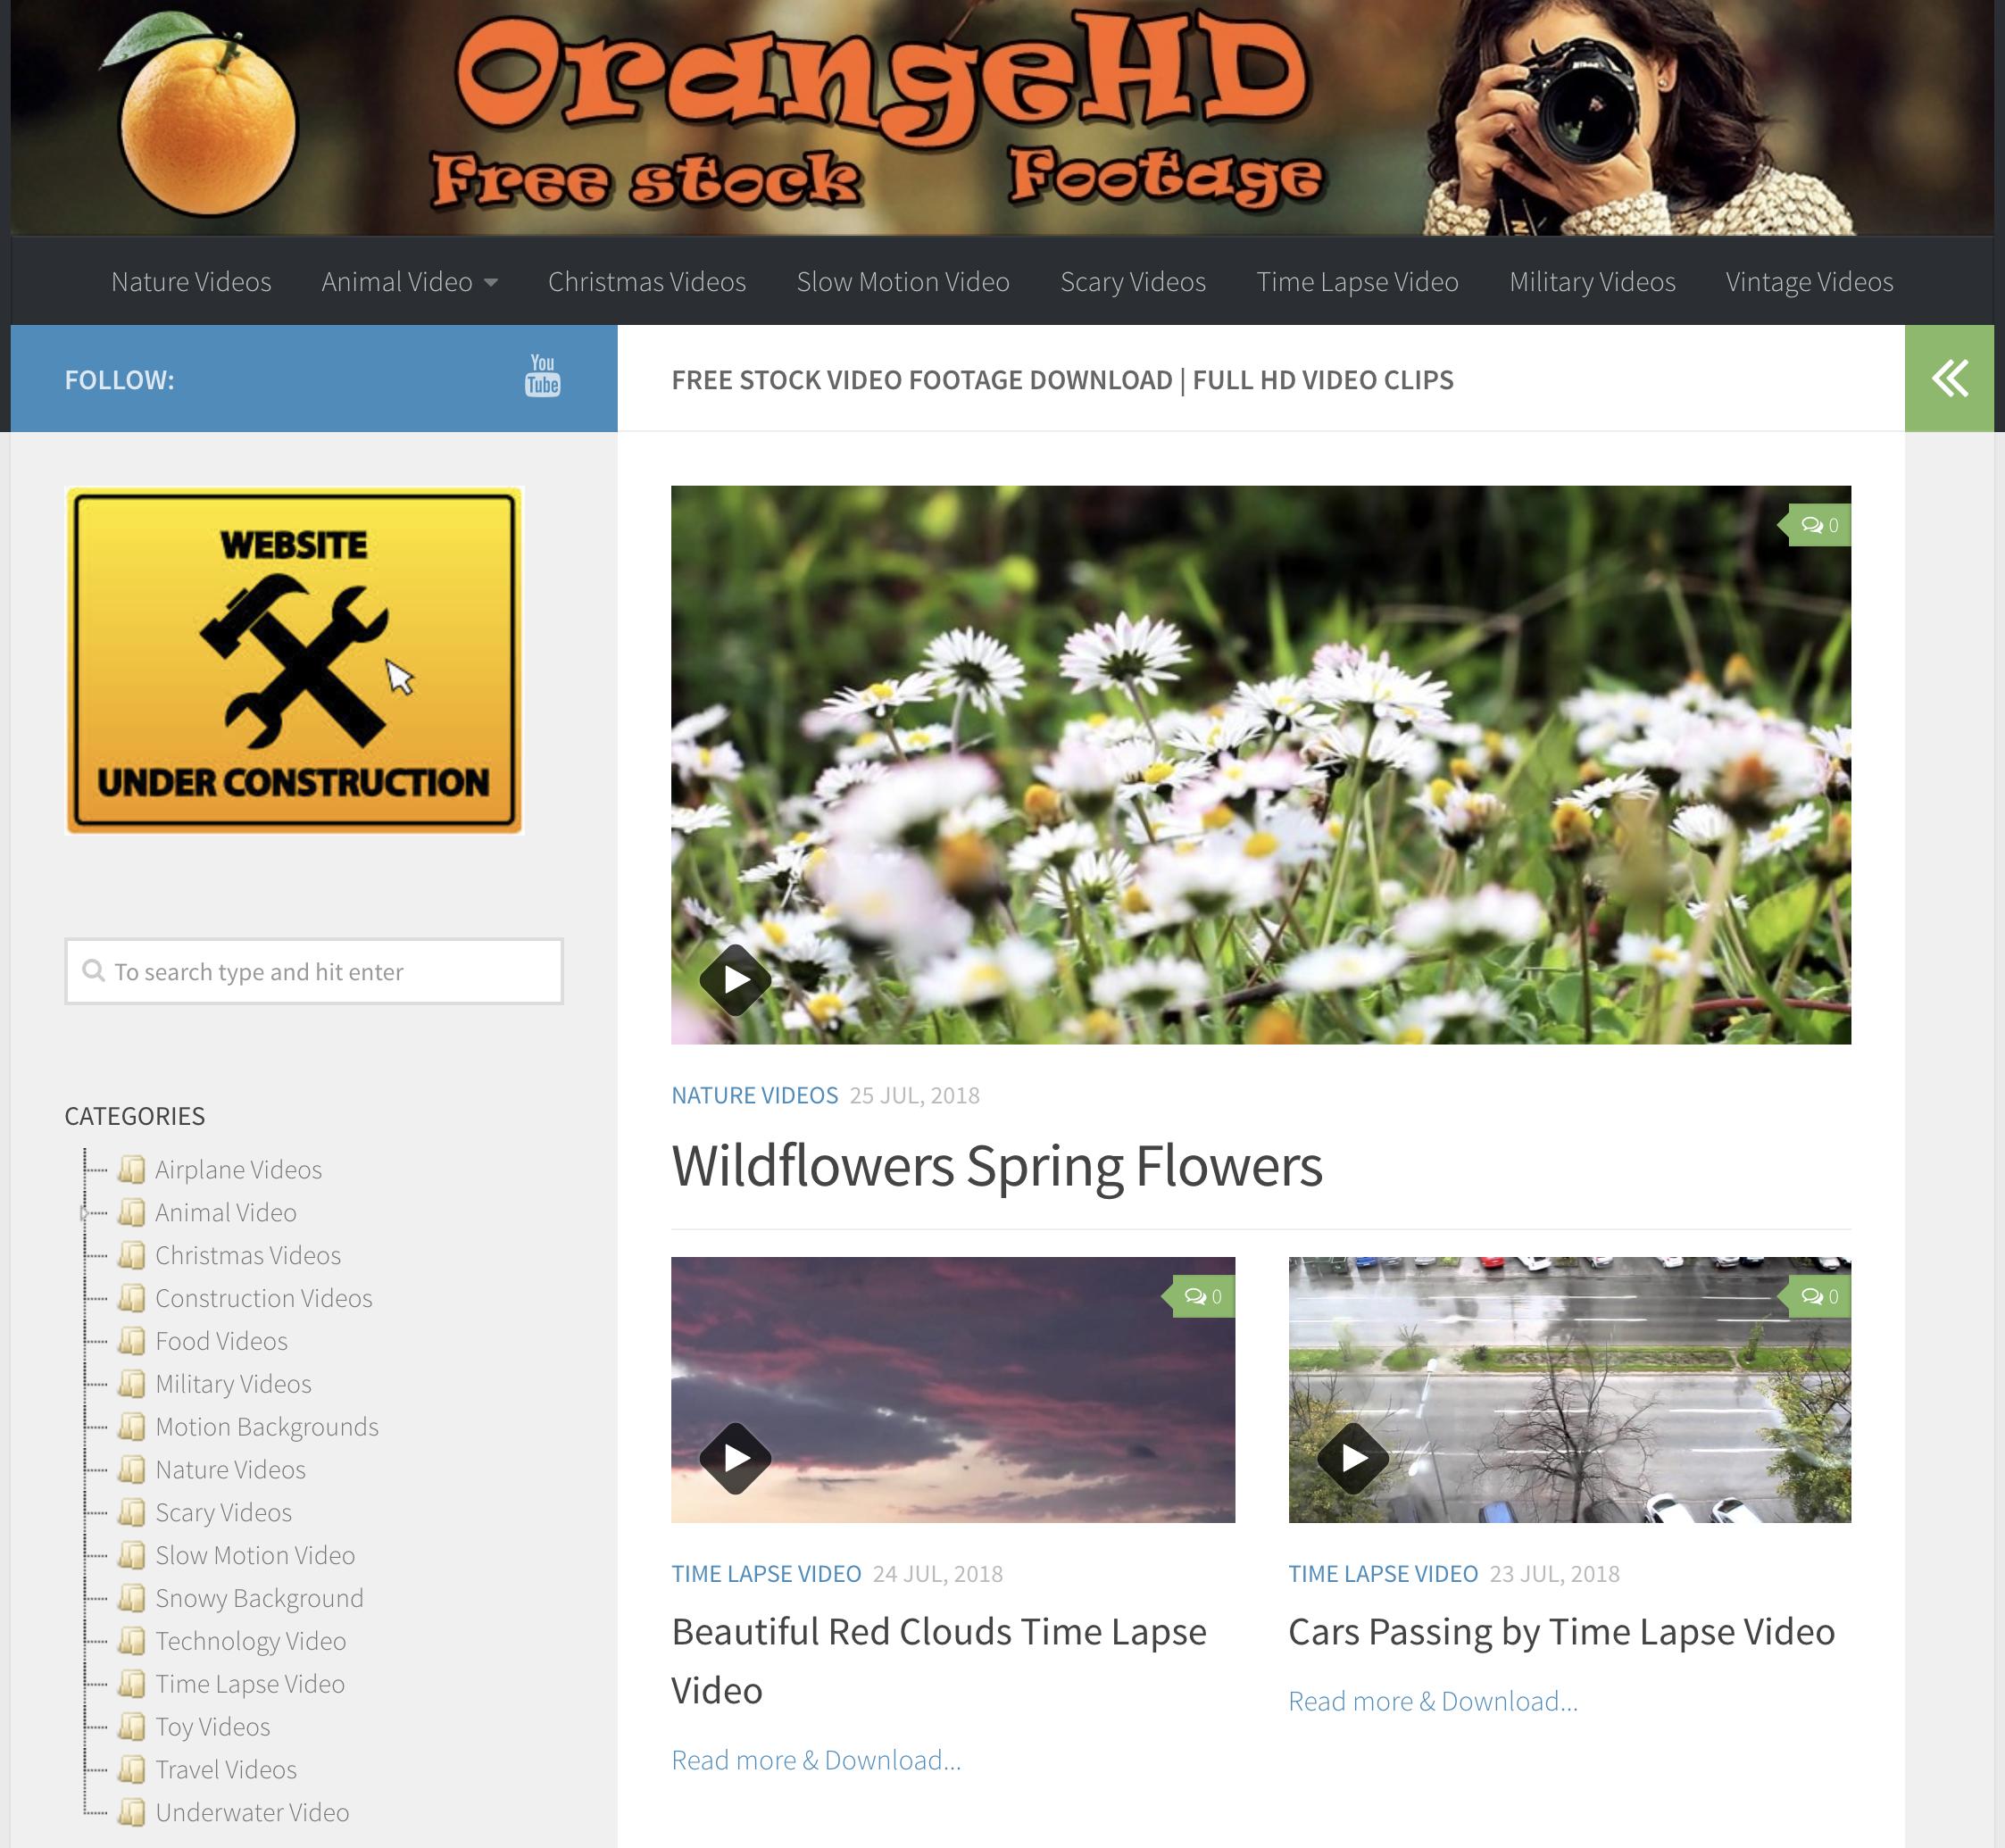 orangehd-free-stock-footage